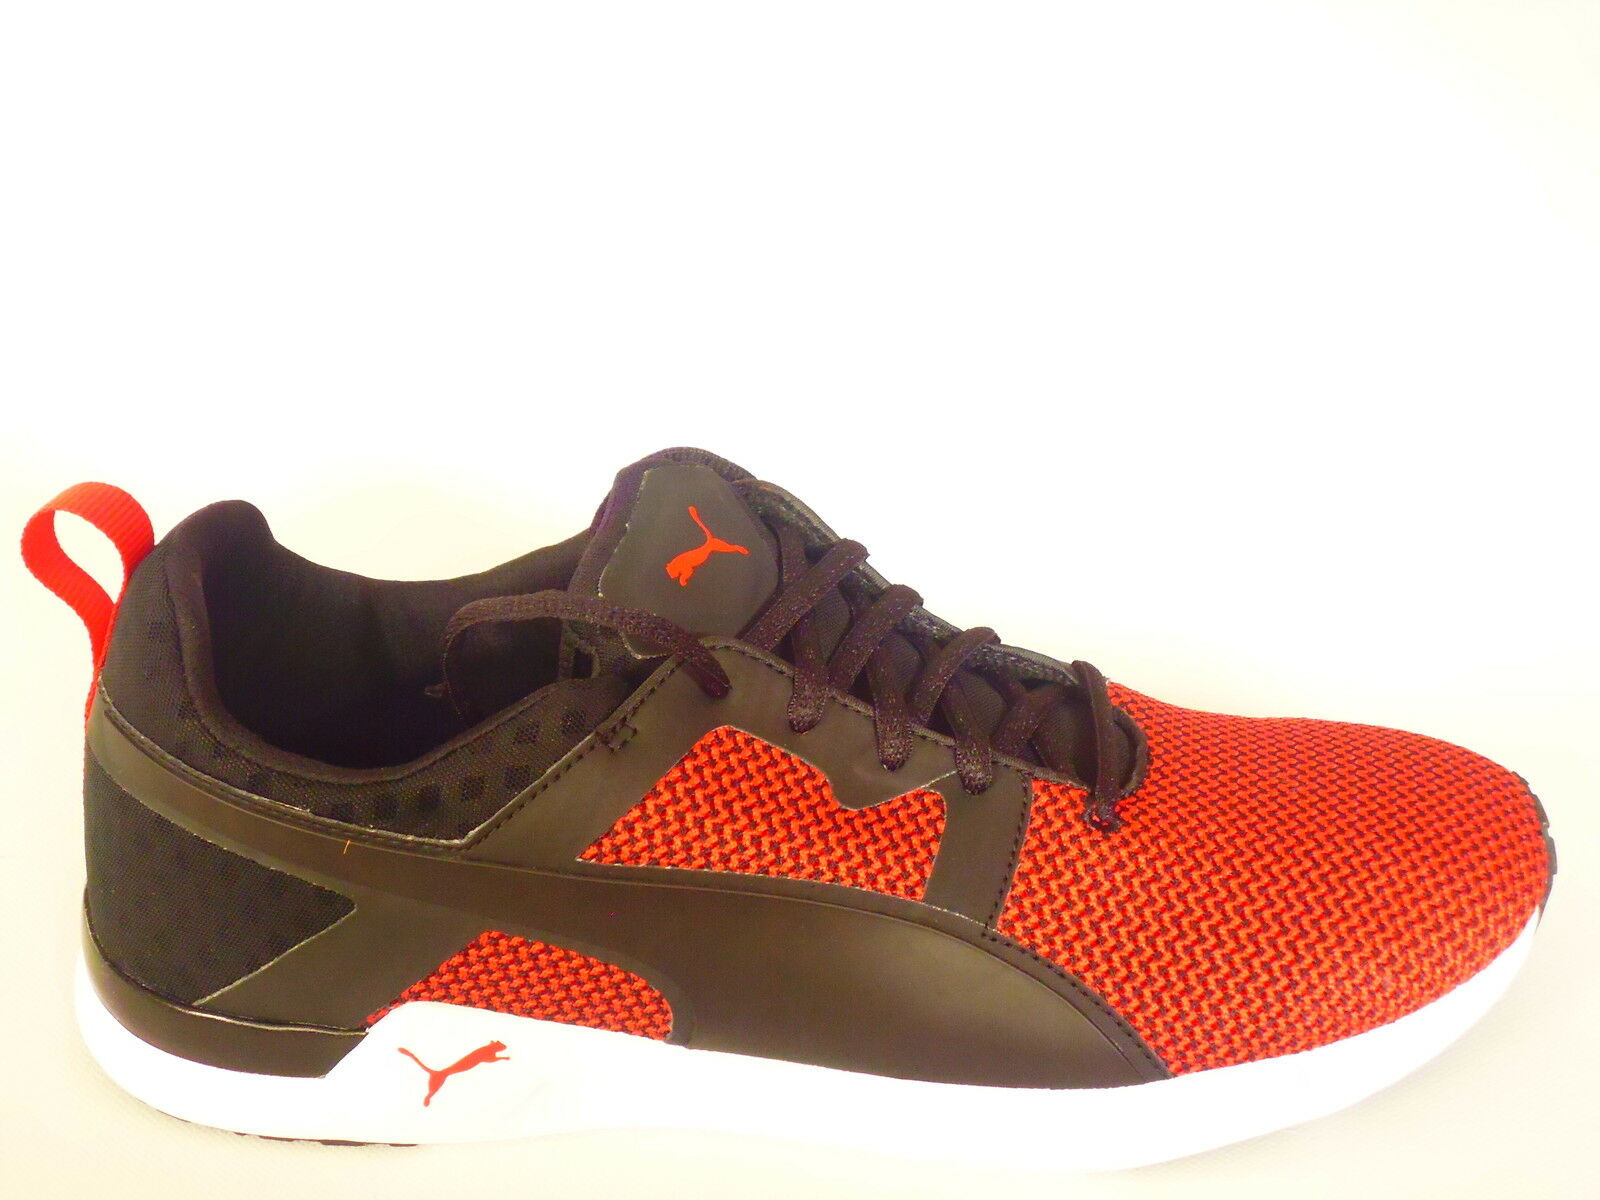 Puma Herren Schuhe Sneakers, Puma Training Training Puma  Pulse XT Herren Sneakers Turnschuhe 74da12